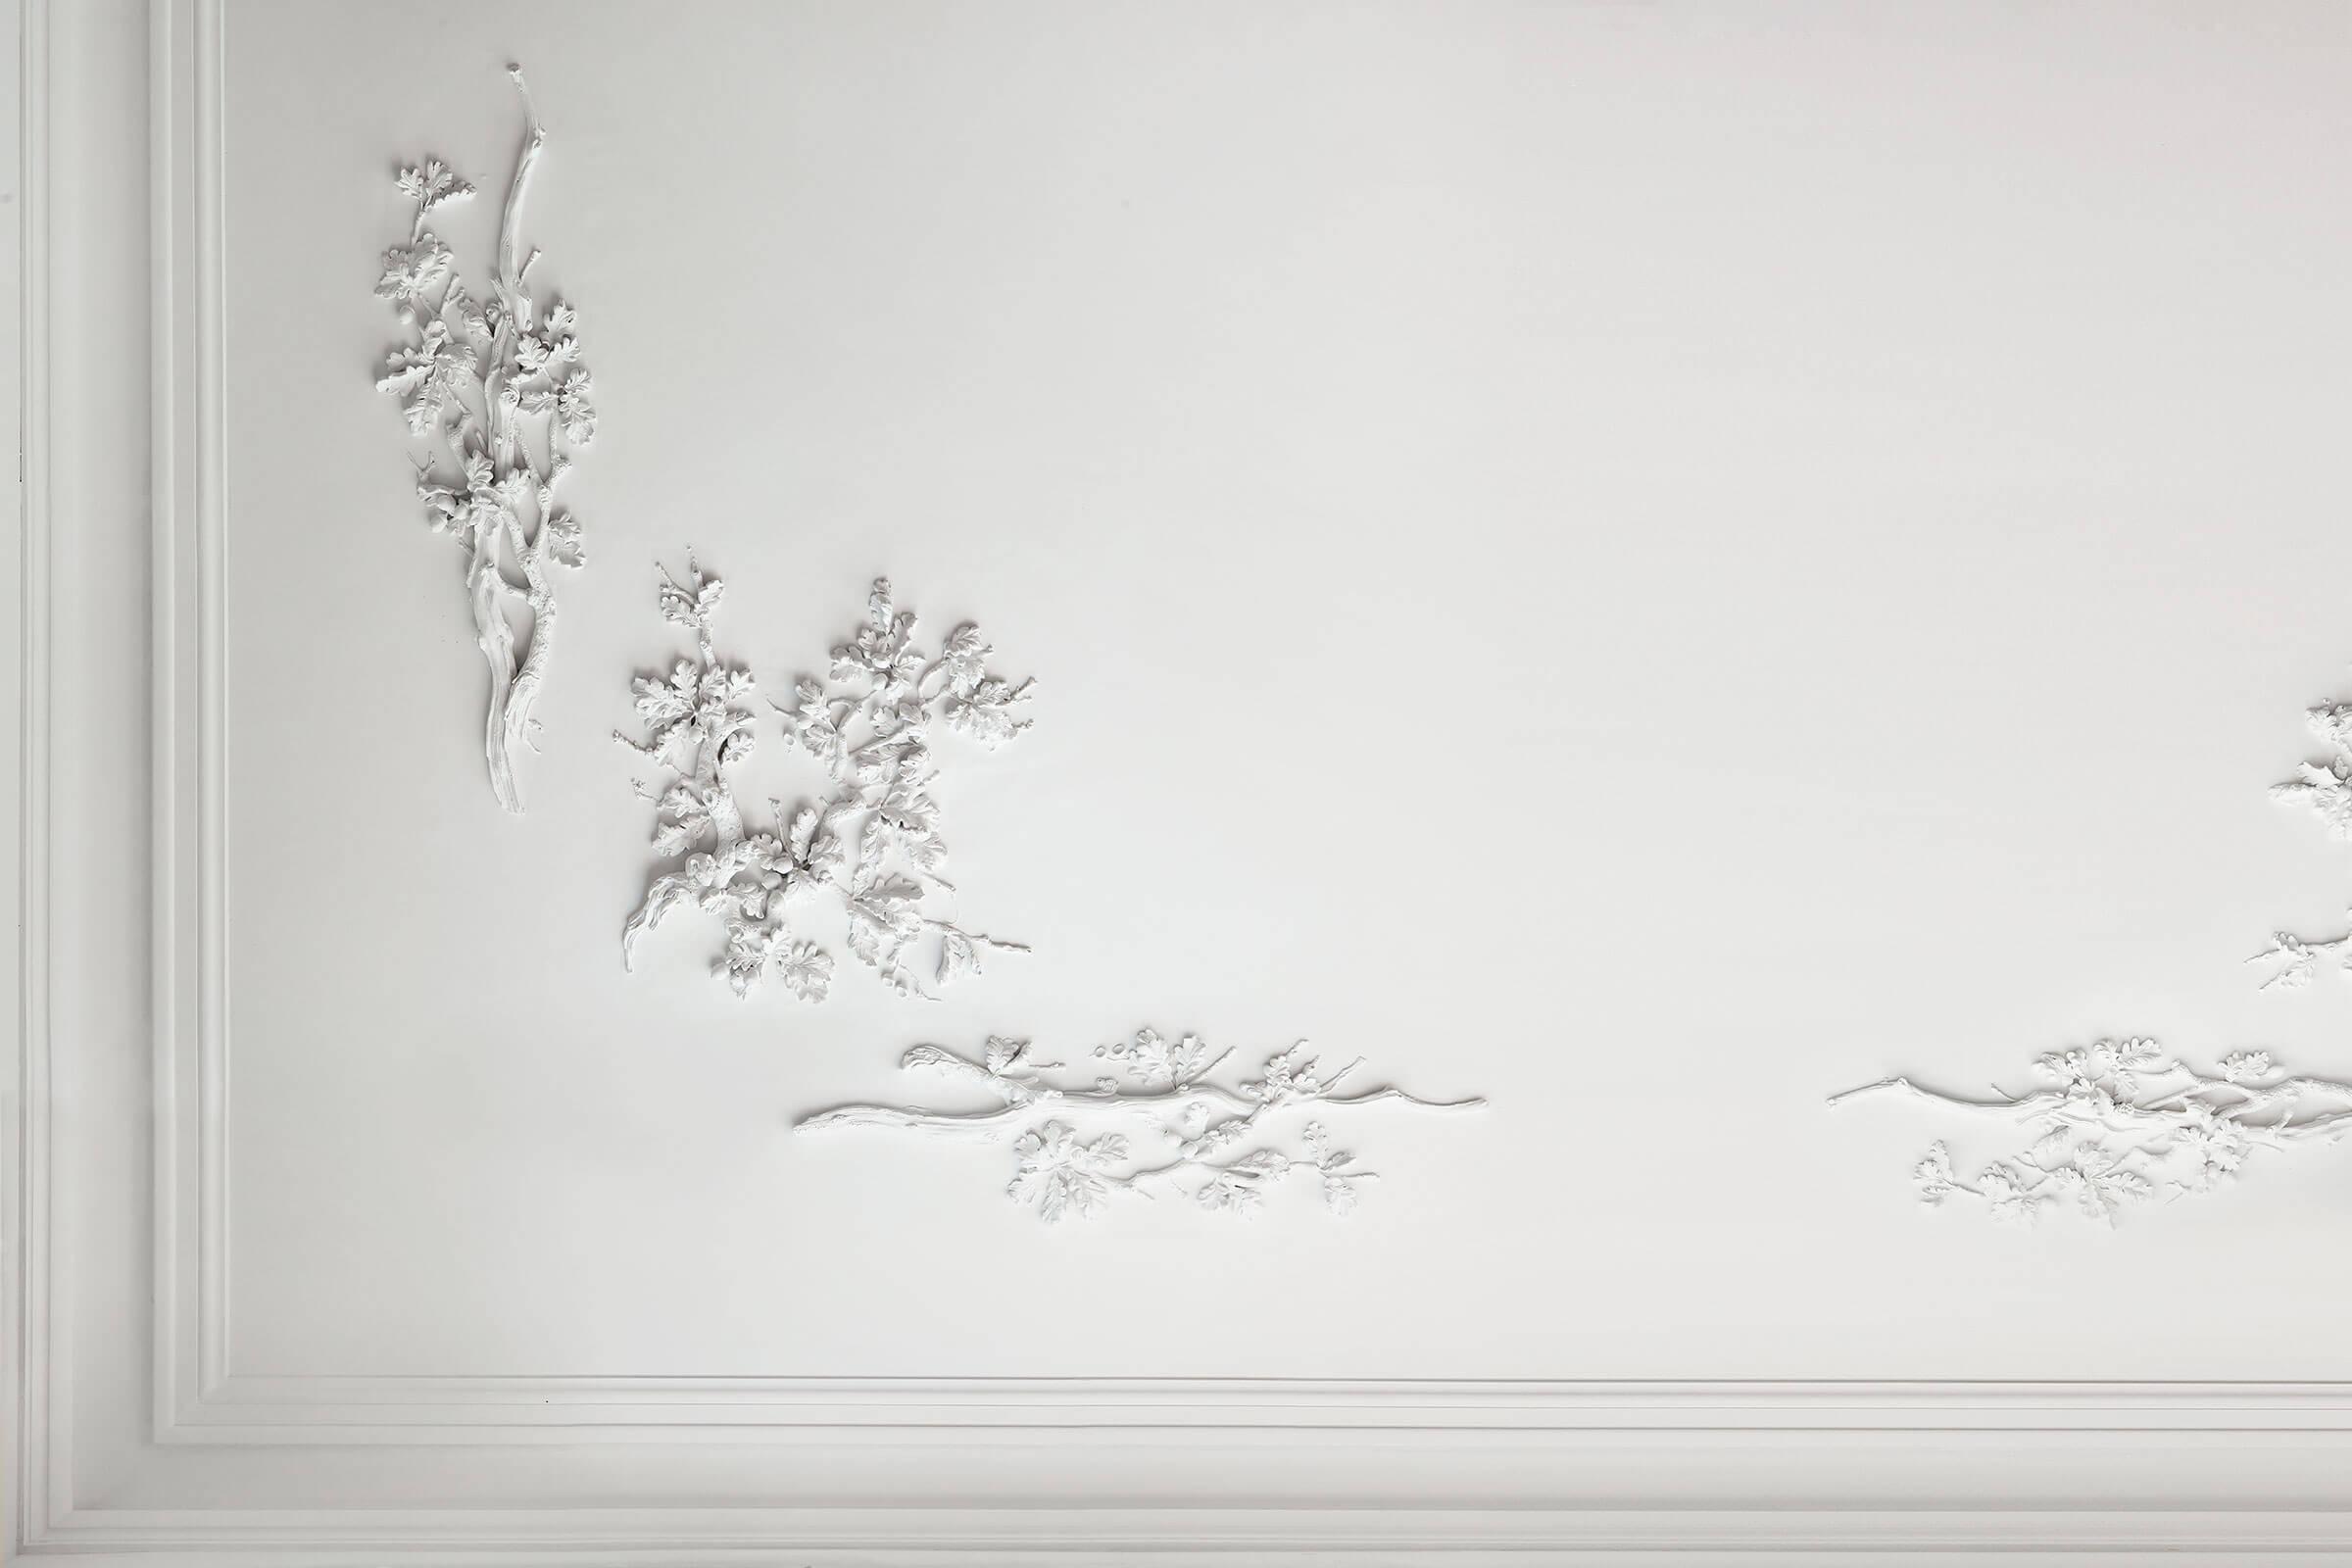 design interior stucco claus lind © craft oaks